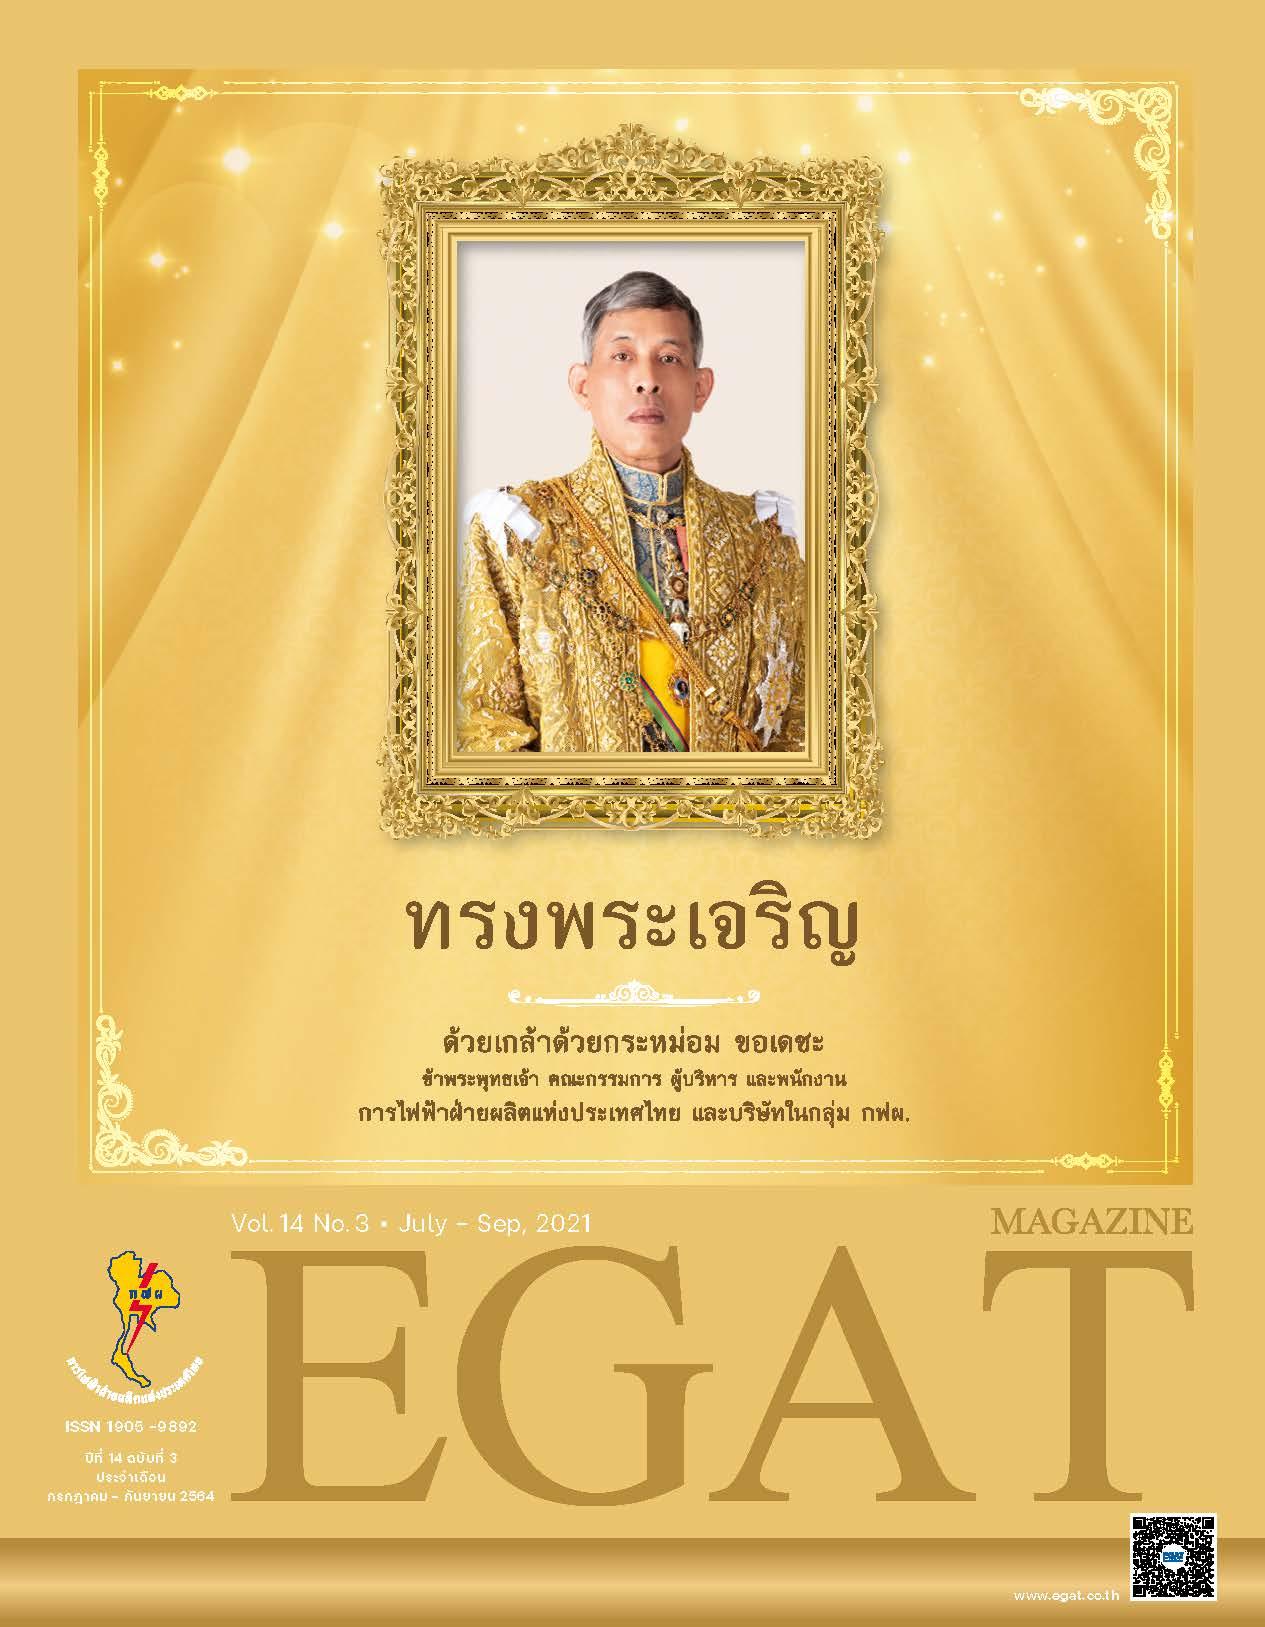 EGAT Magazine 2564 Vol.3